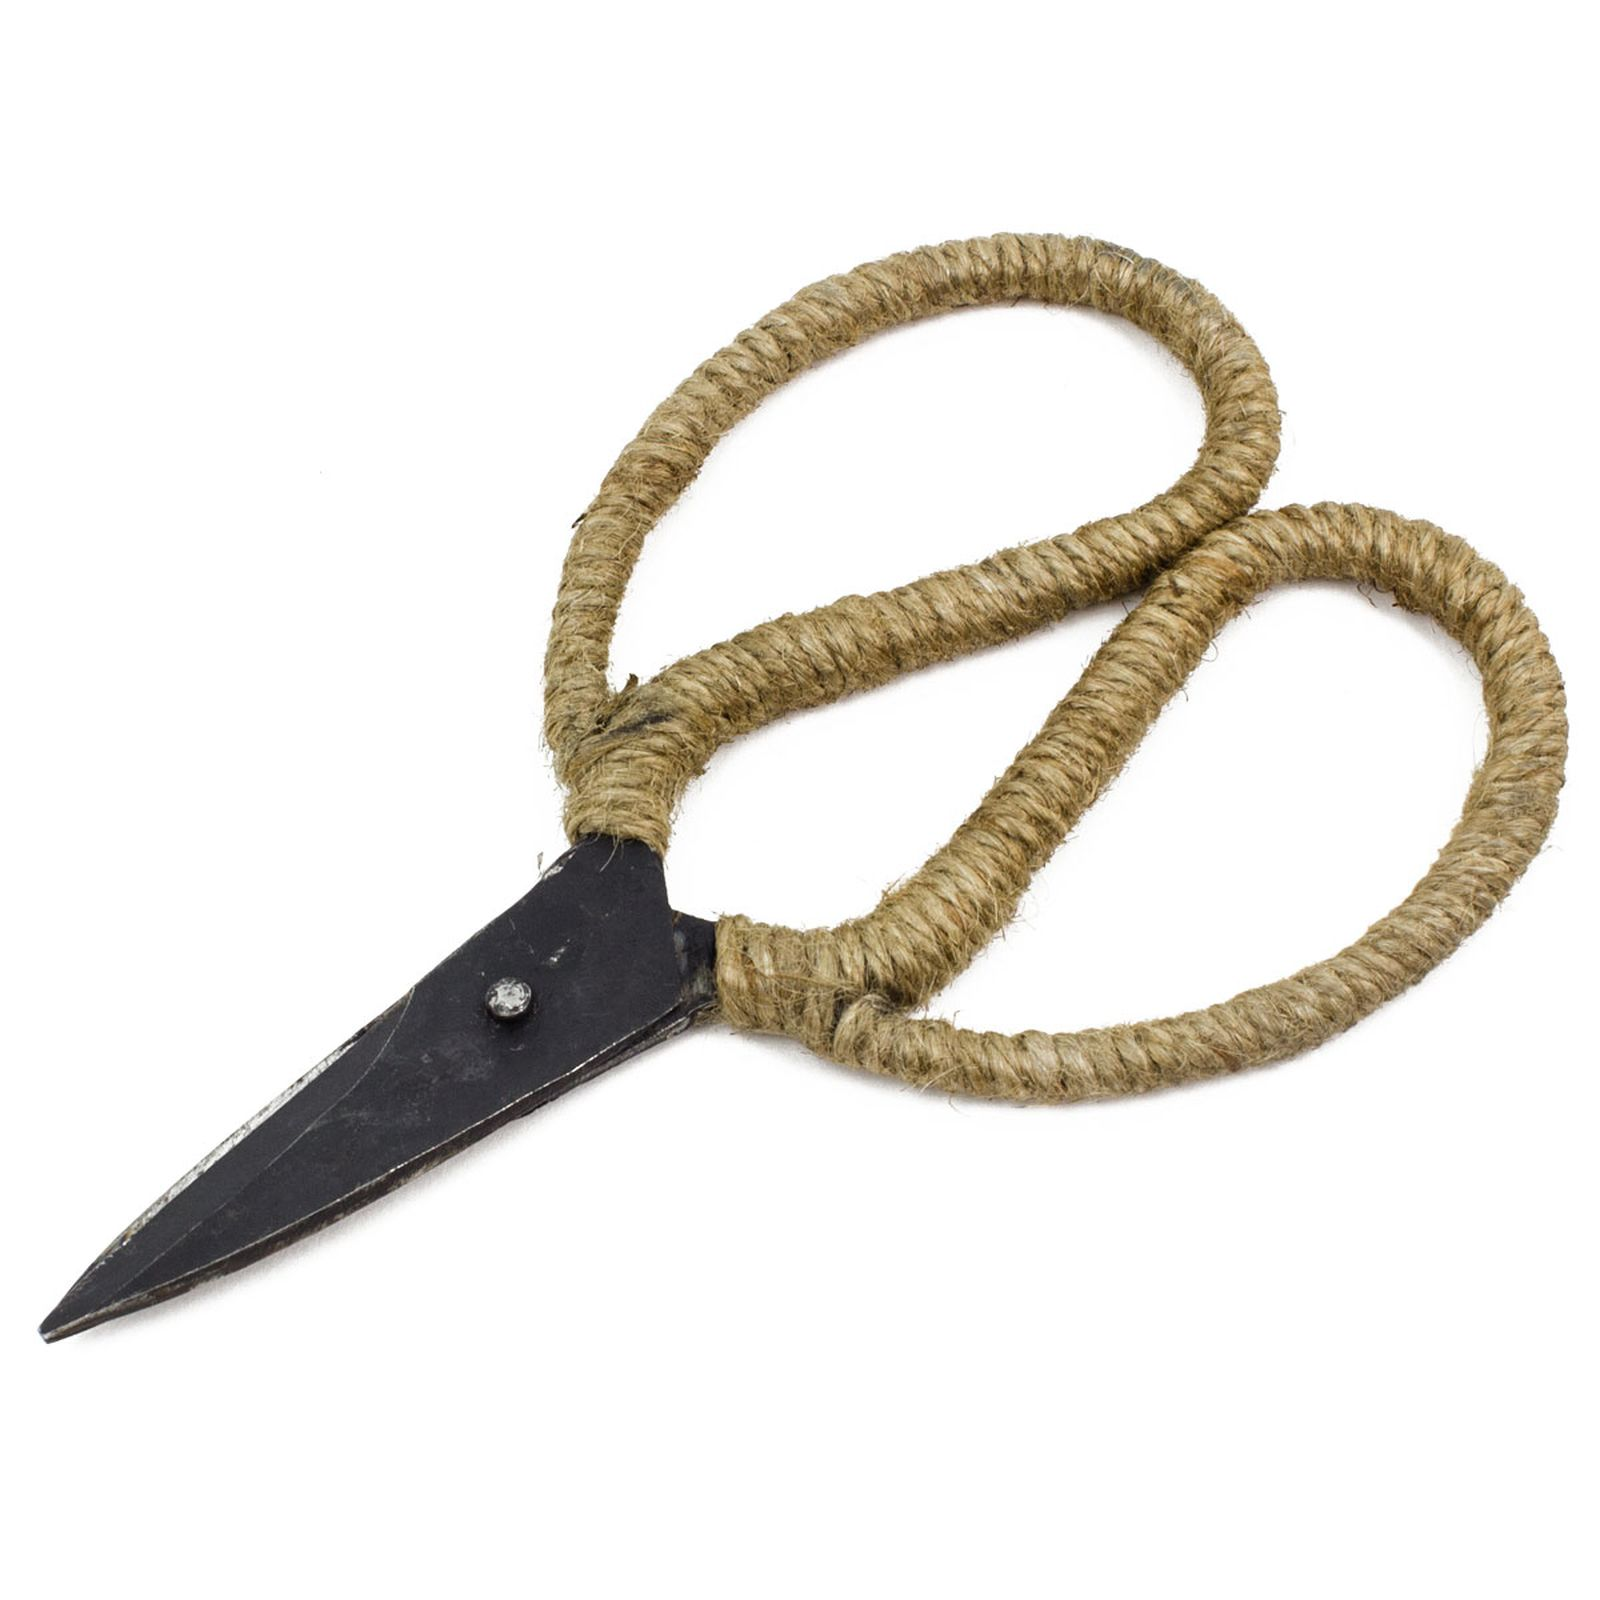 Käsintaotut sakset, terän pituus n.5cm